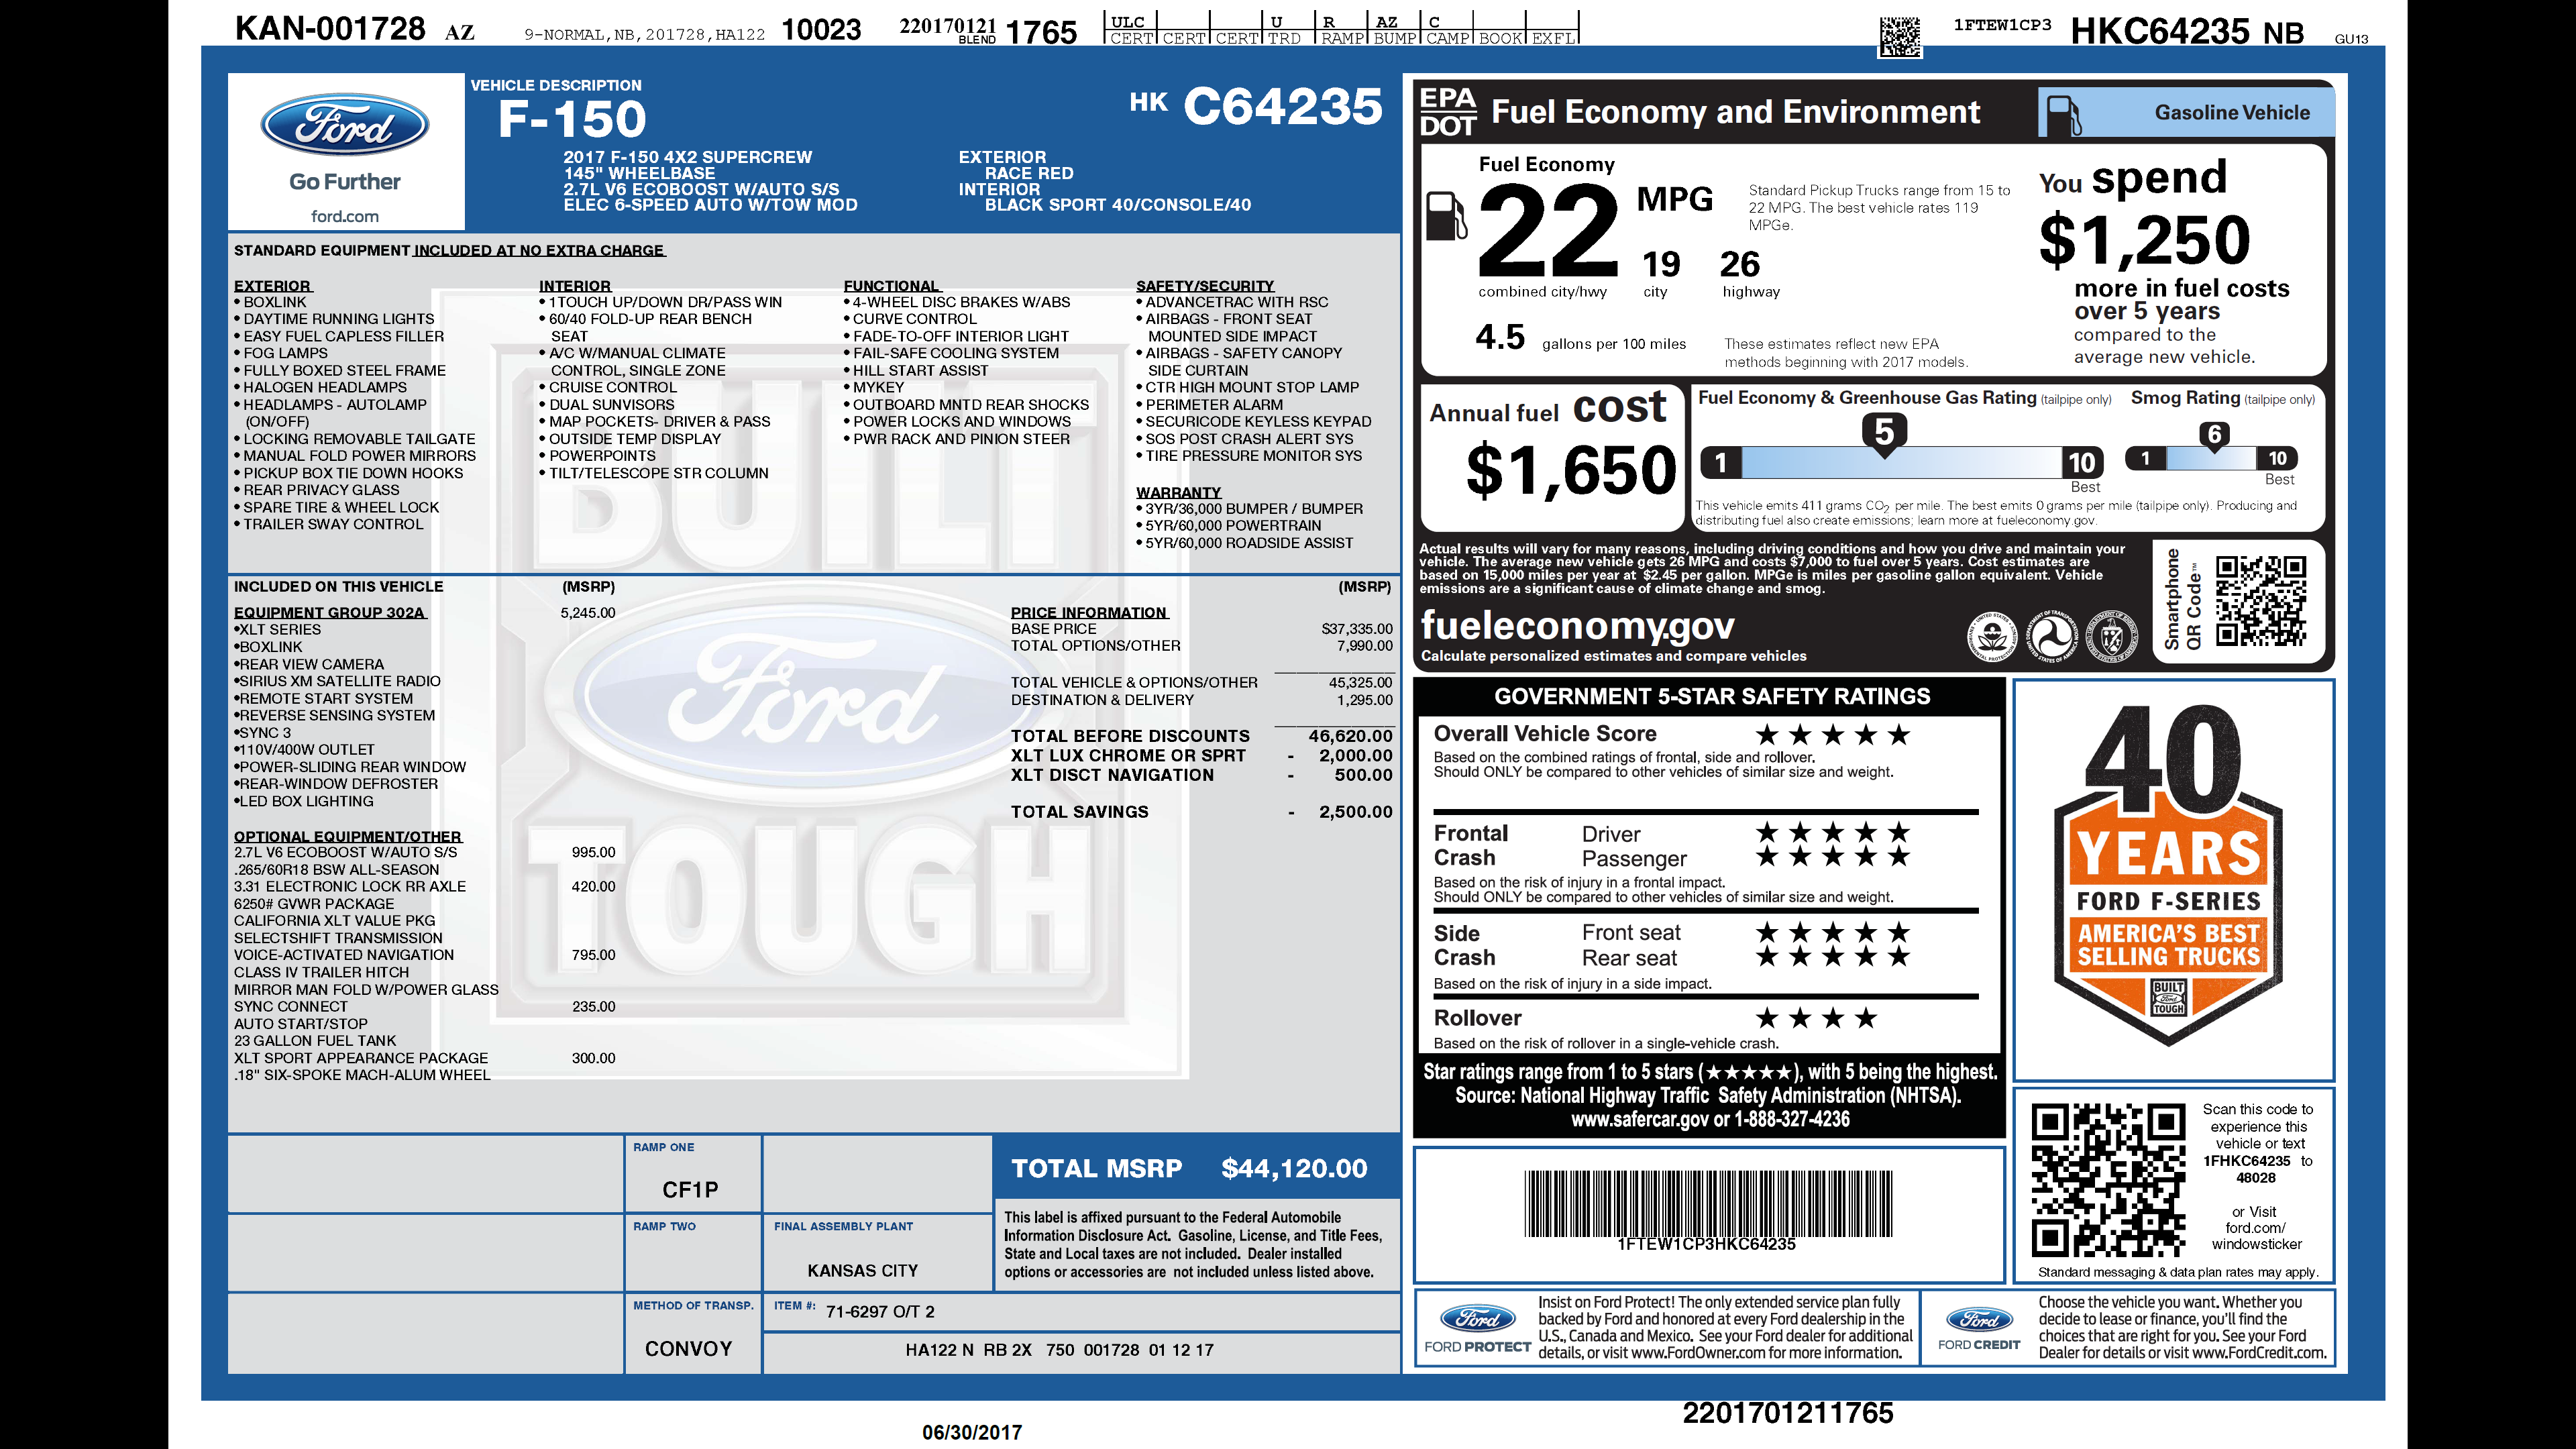 2014 F150 Platinum >> Just bought a 2017 F150 XLT 2.7 Ecoboost - wondering if I got a good deal